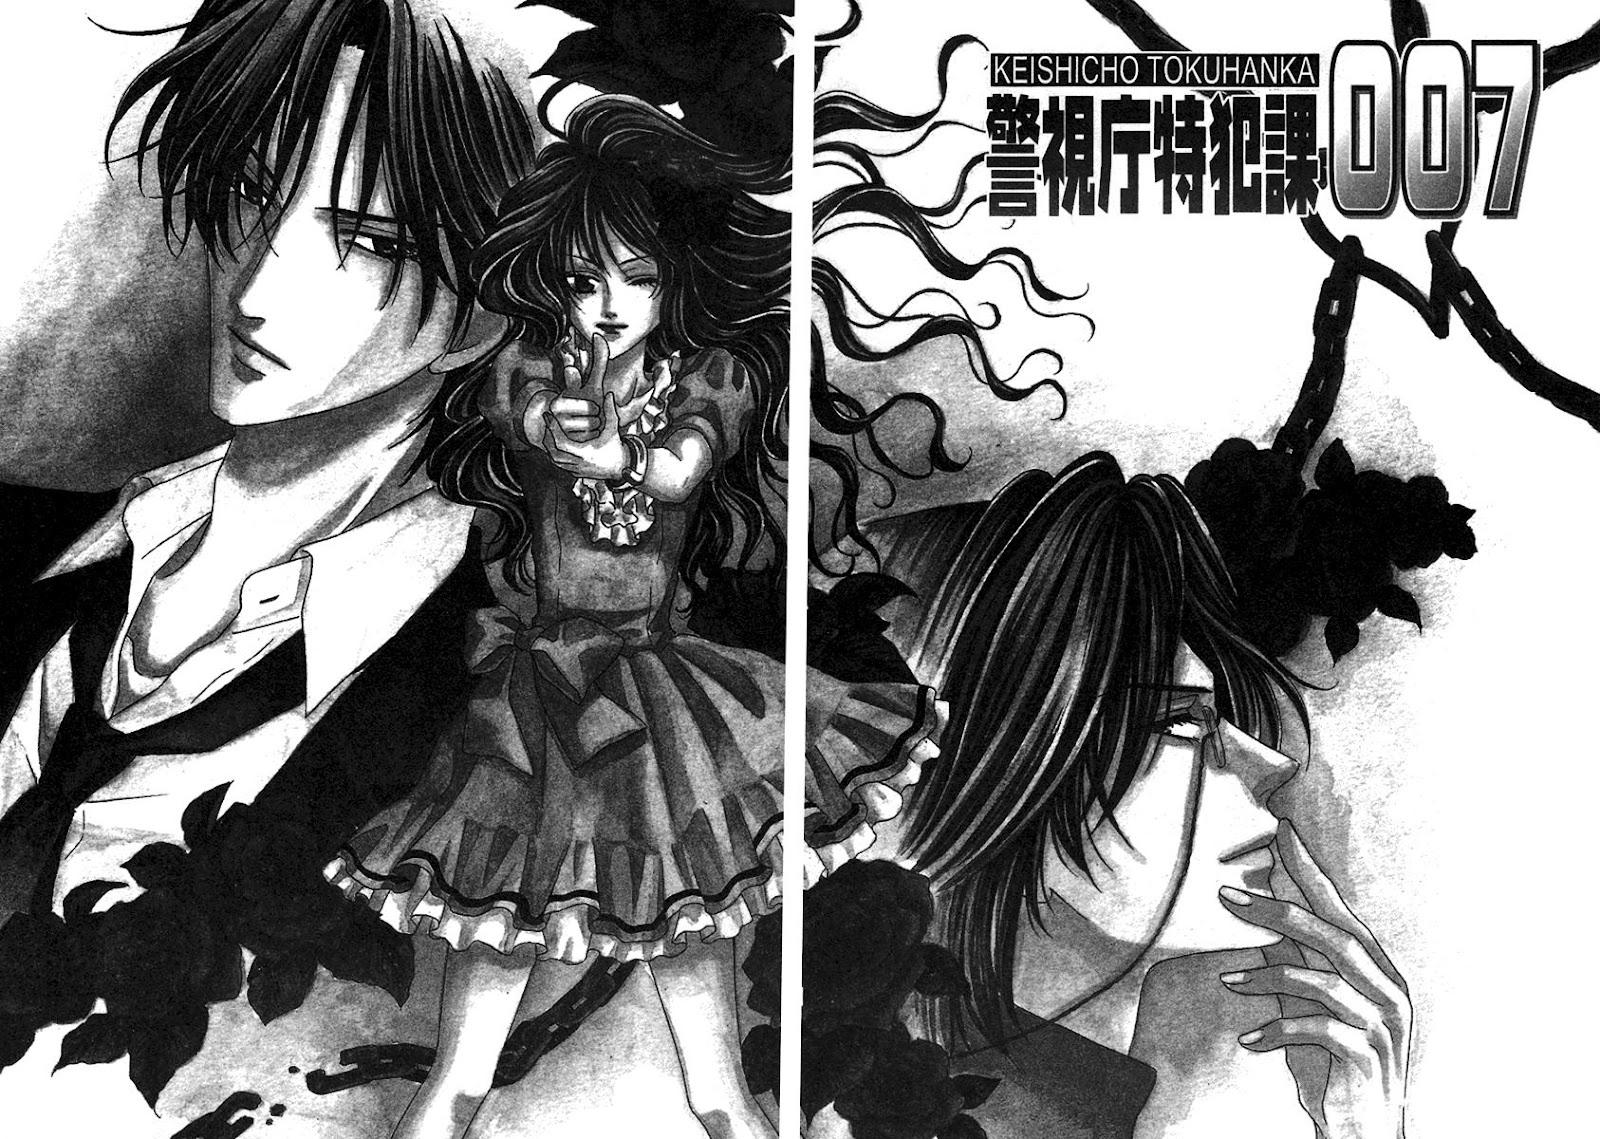 Keishichou Tokuhanka 007 Vol.10 Ch.26 page 7 at www.Mangago.me